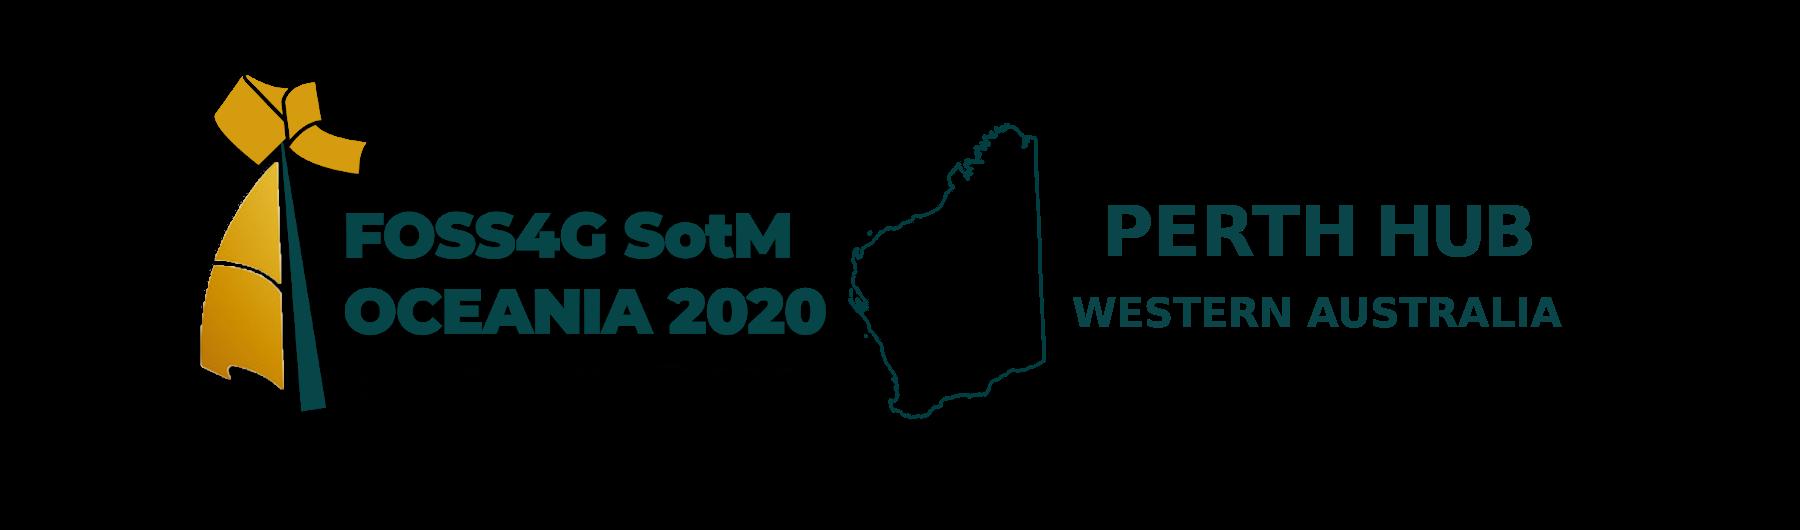 FOSS4G SotM Oceania 2020 - Perth Hub